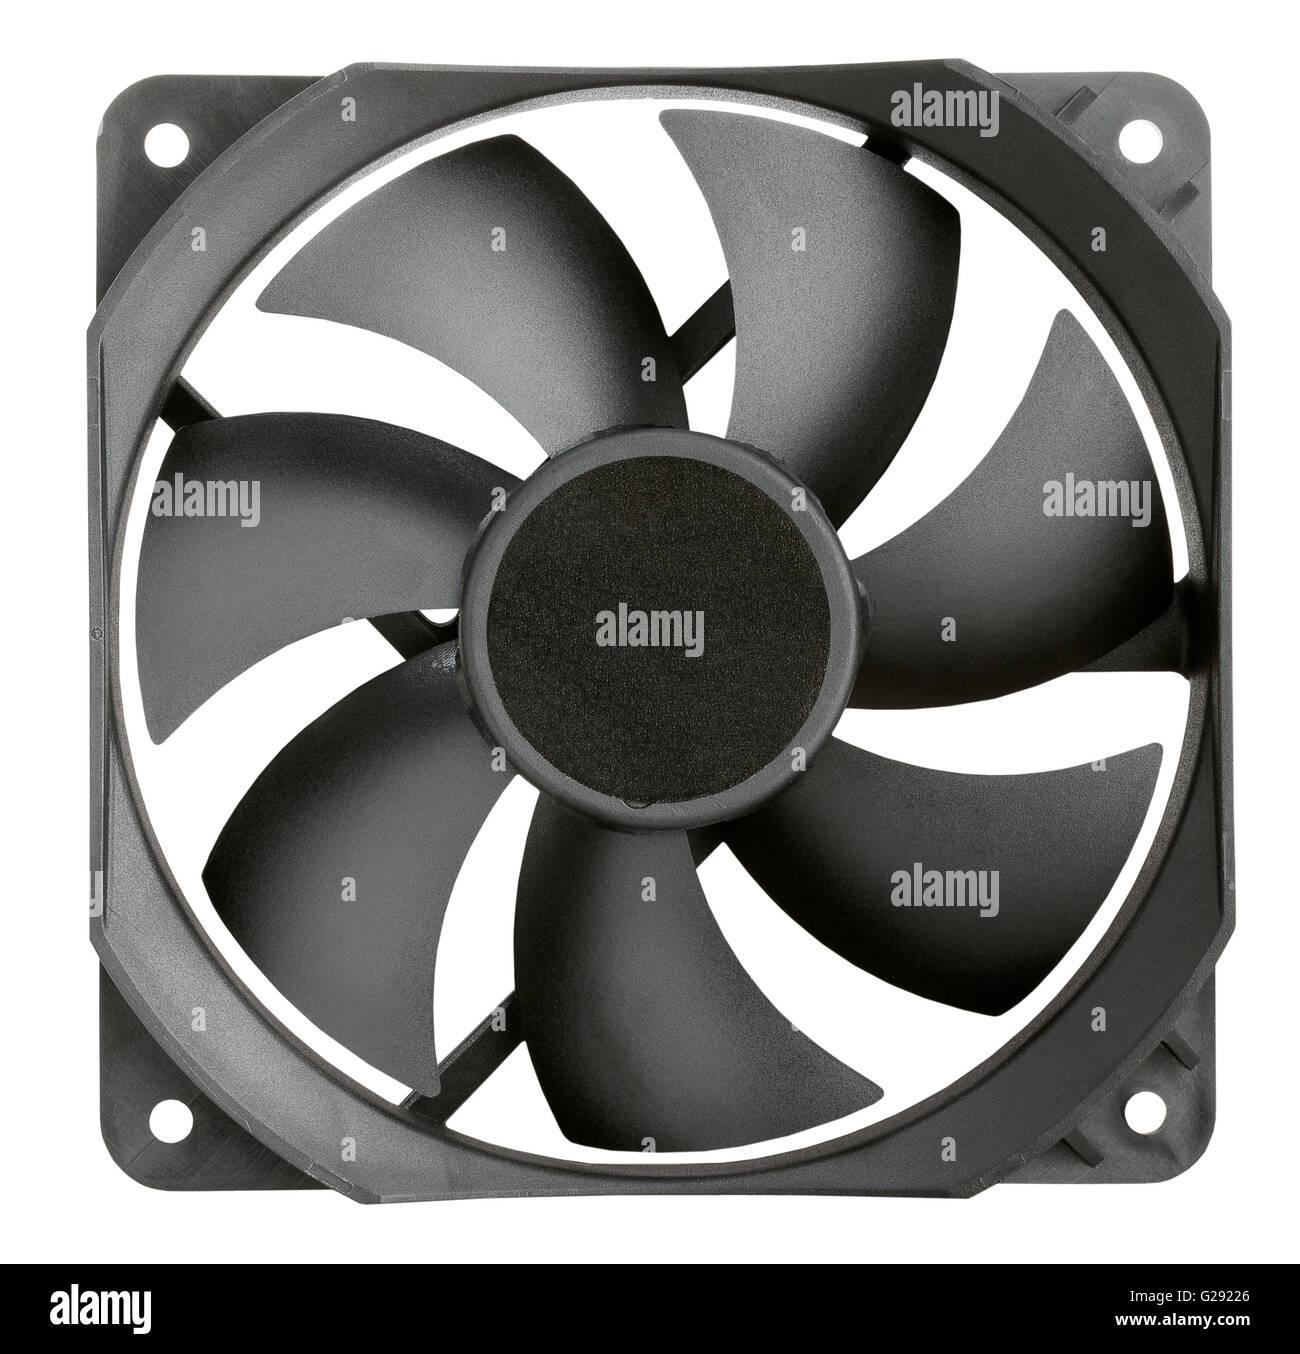 Pc ventola radiatore isolato Immagini Stock